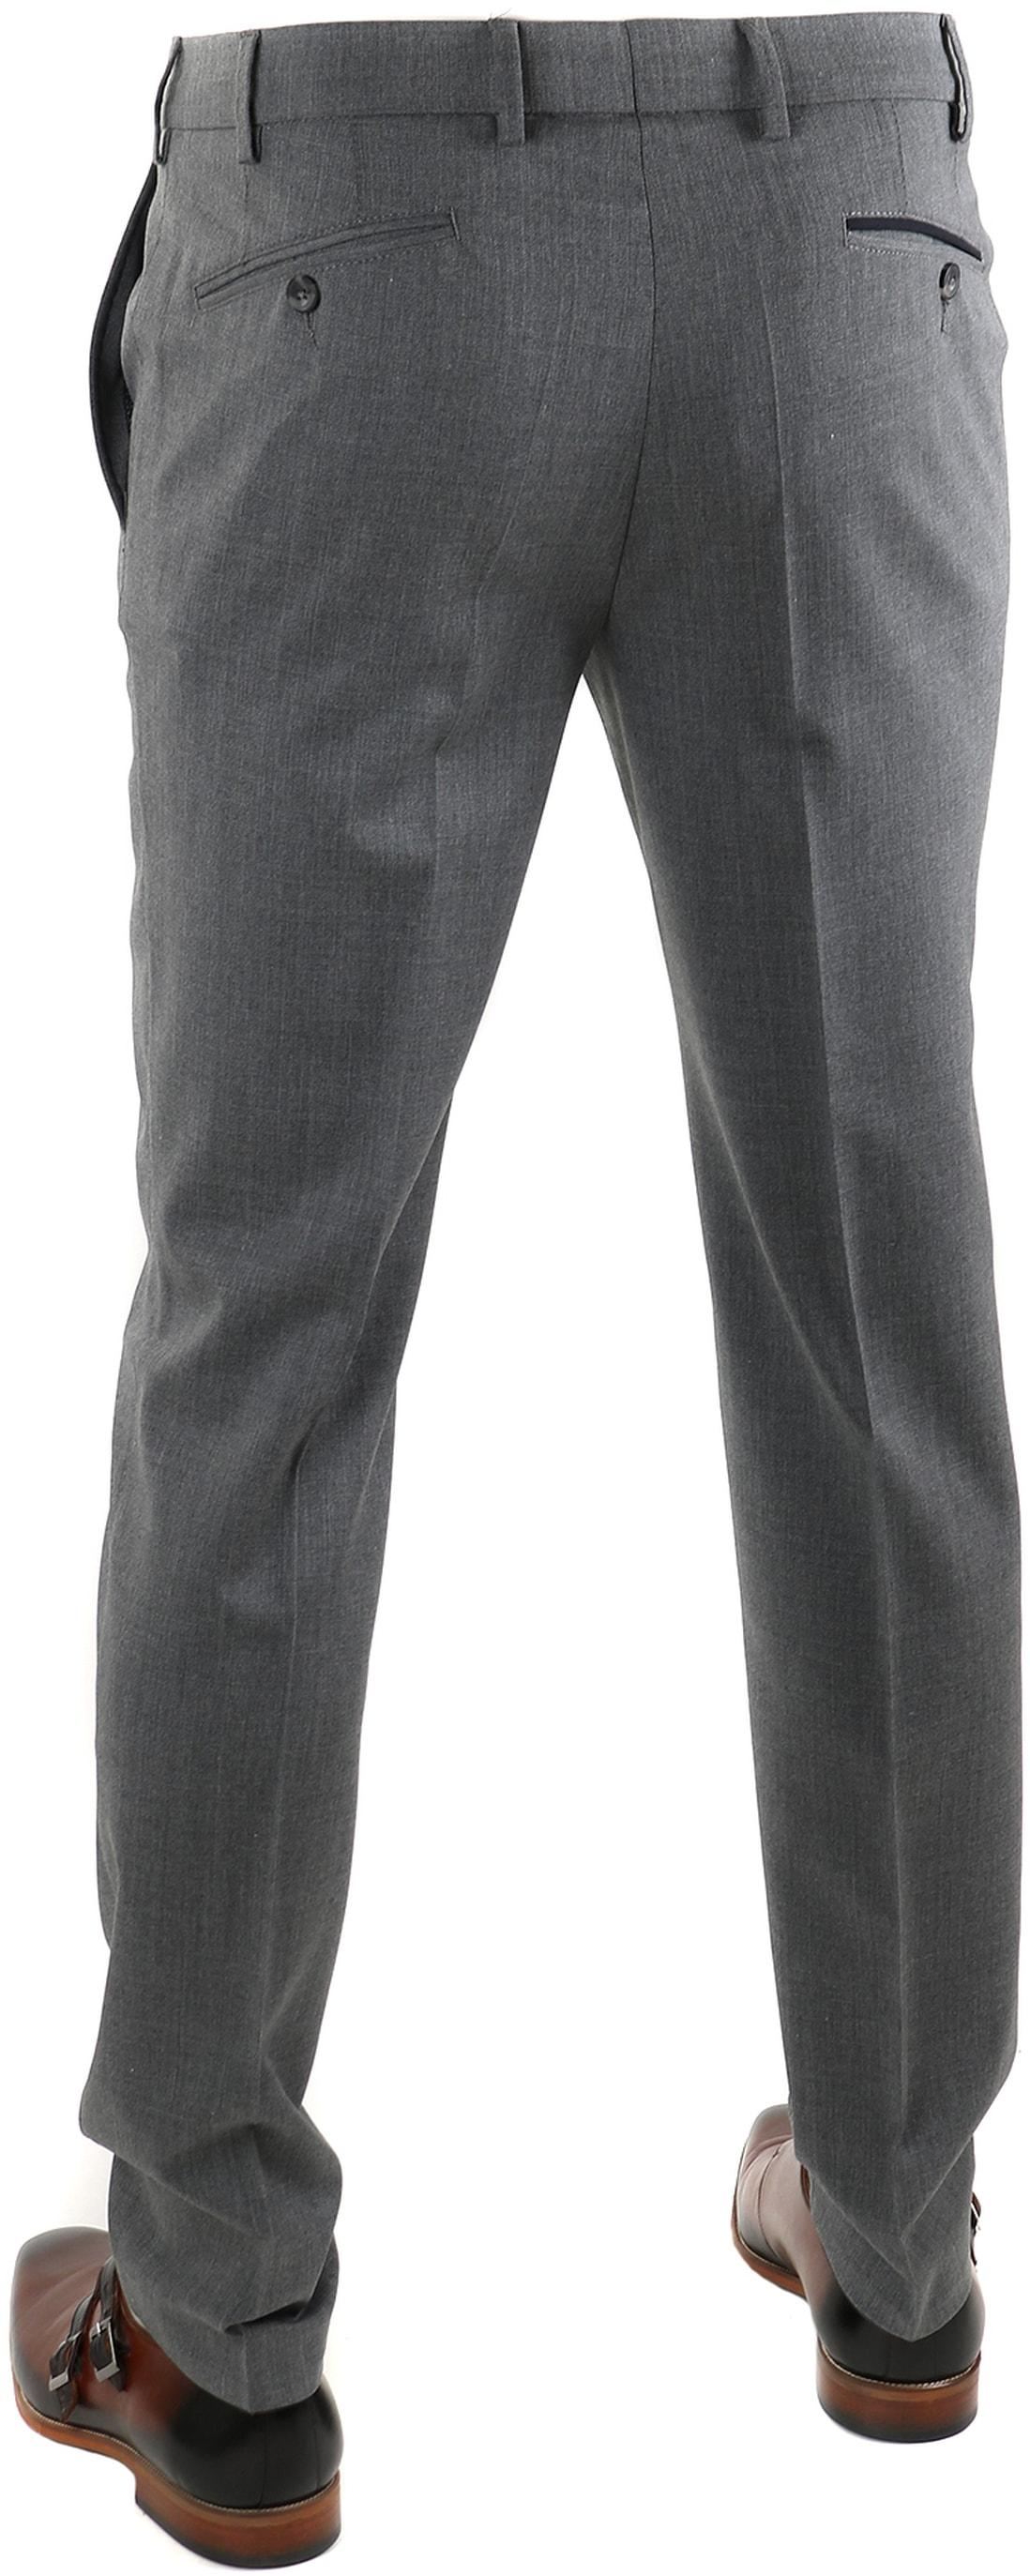 Suitable Pantalon Middengrijs foto 1